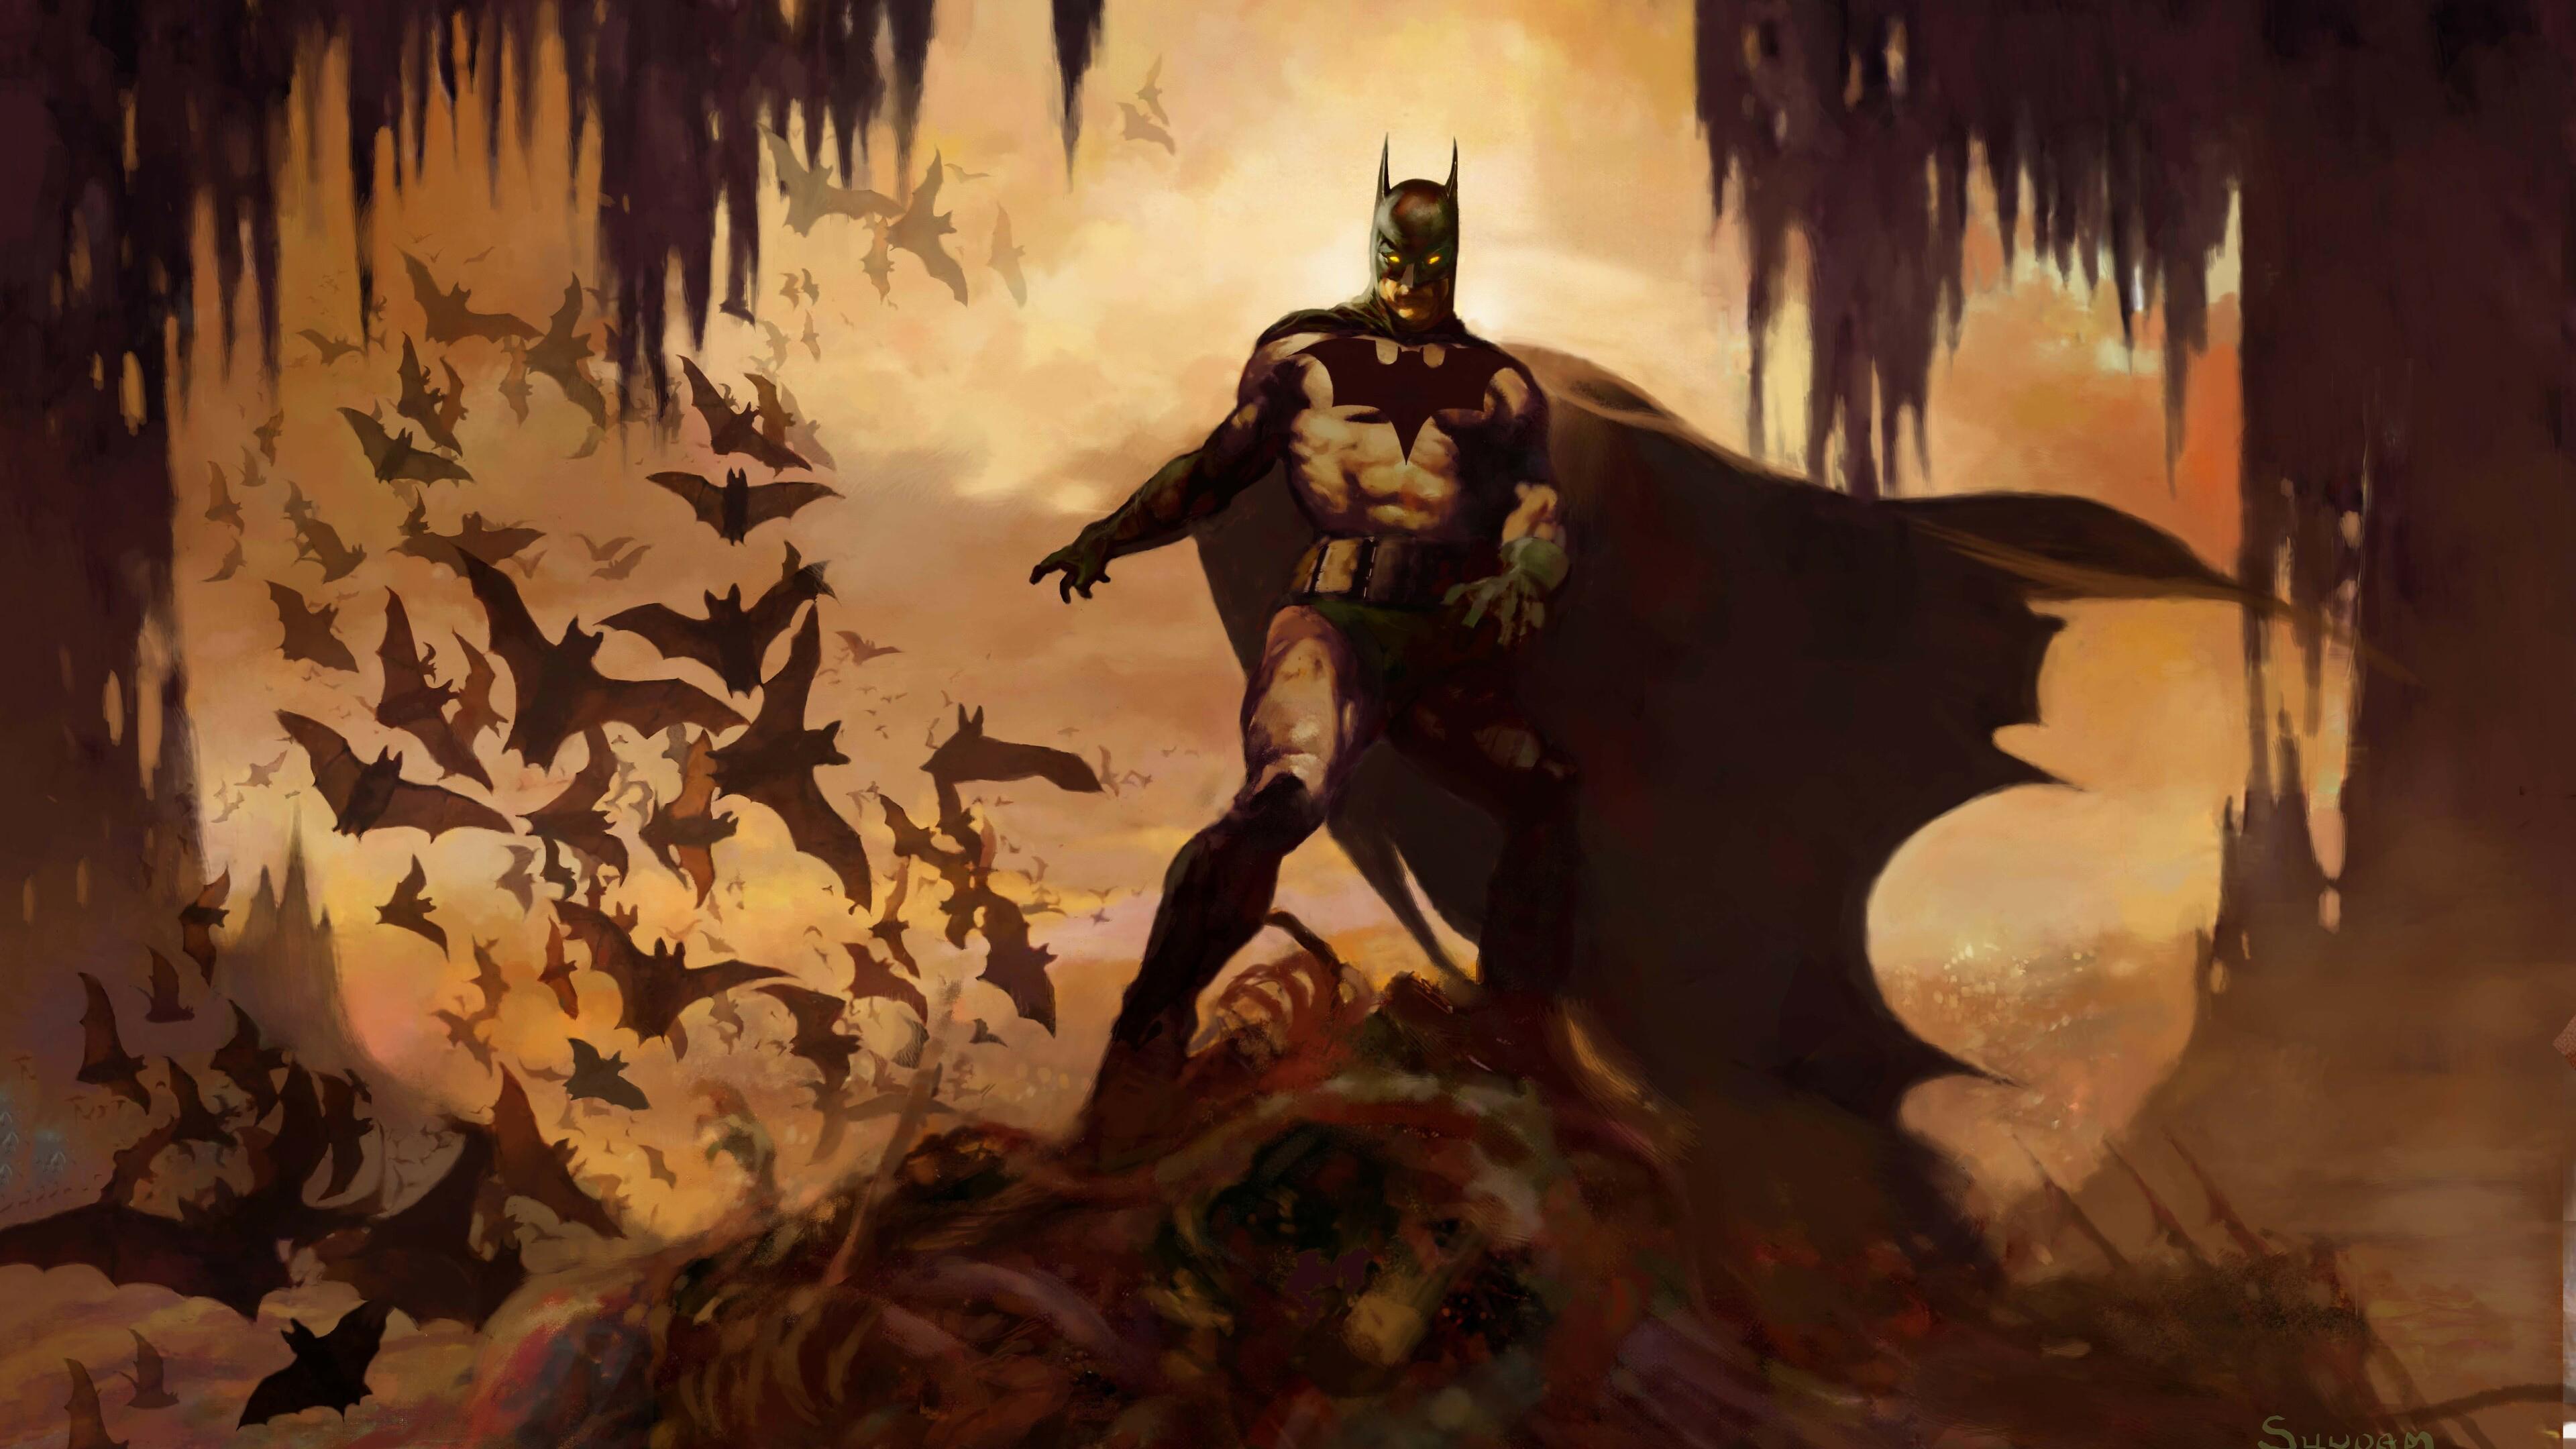 4k batman arts 1553071141 - 4k Batman Arts - superheroes wallpapers, hd-wallpapers, digital art wallpapers, batman wallpapers, artwork wallpapers, 4k-wallpapers